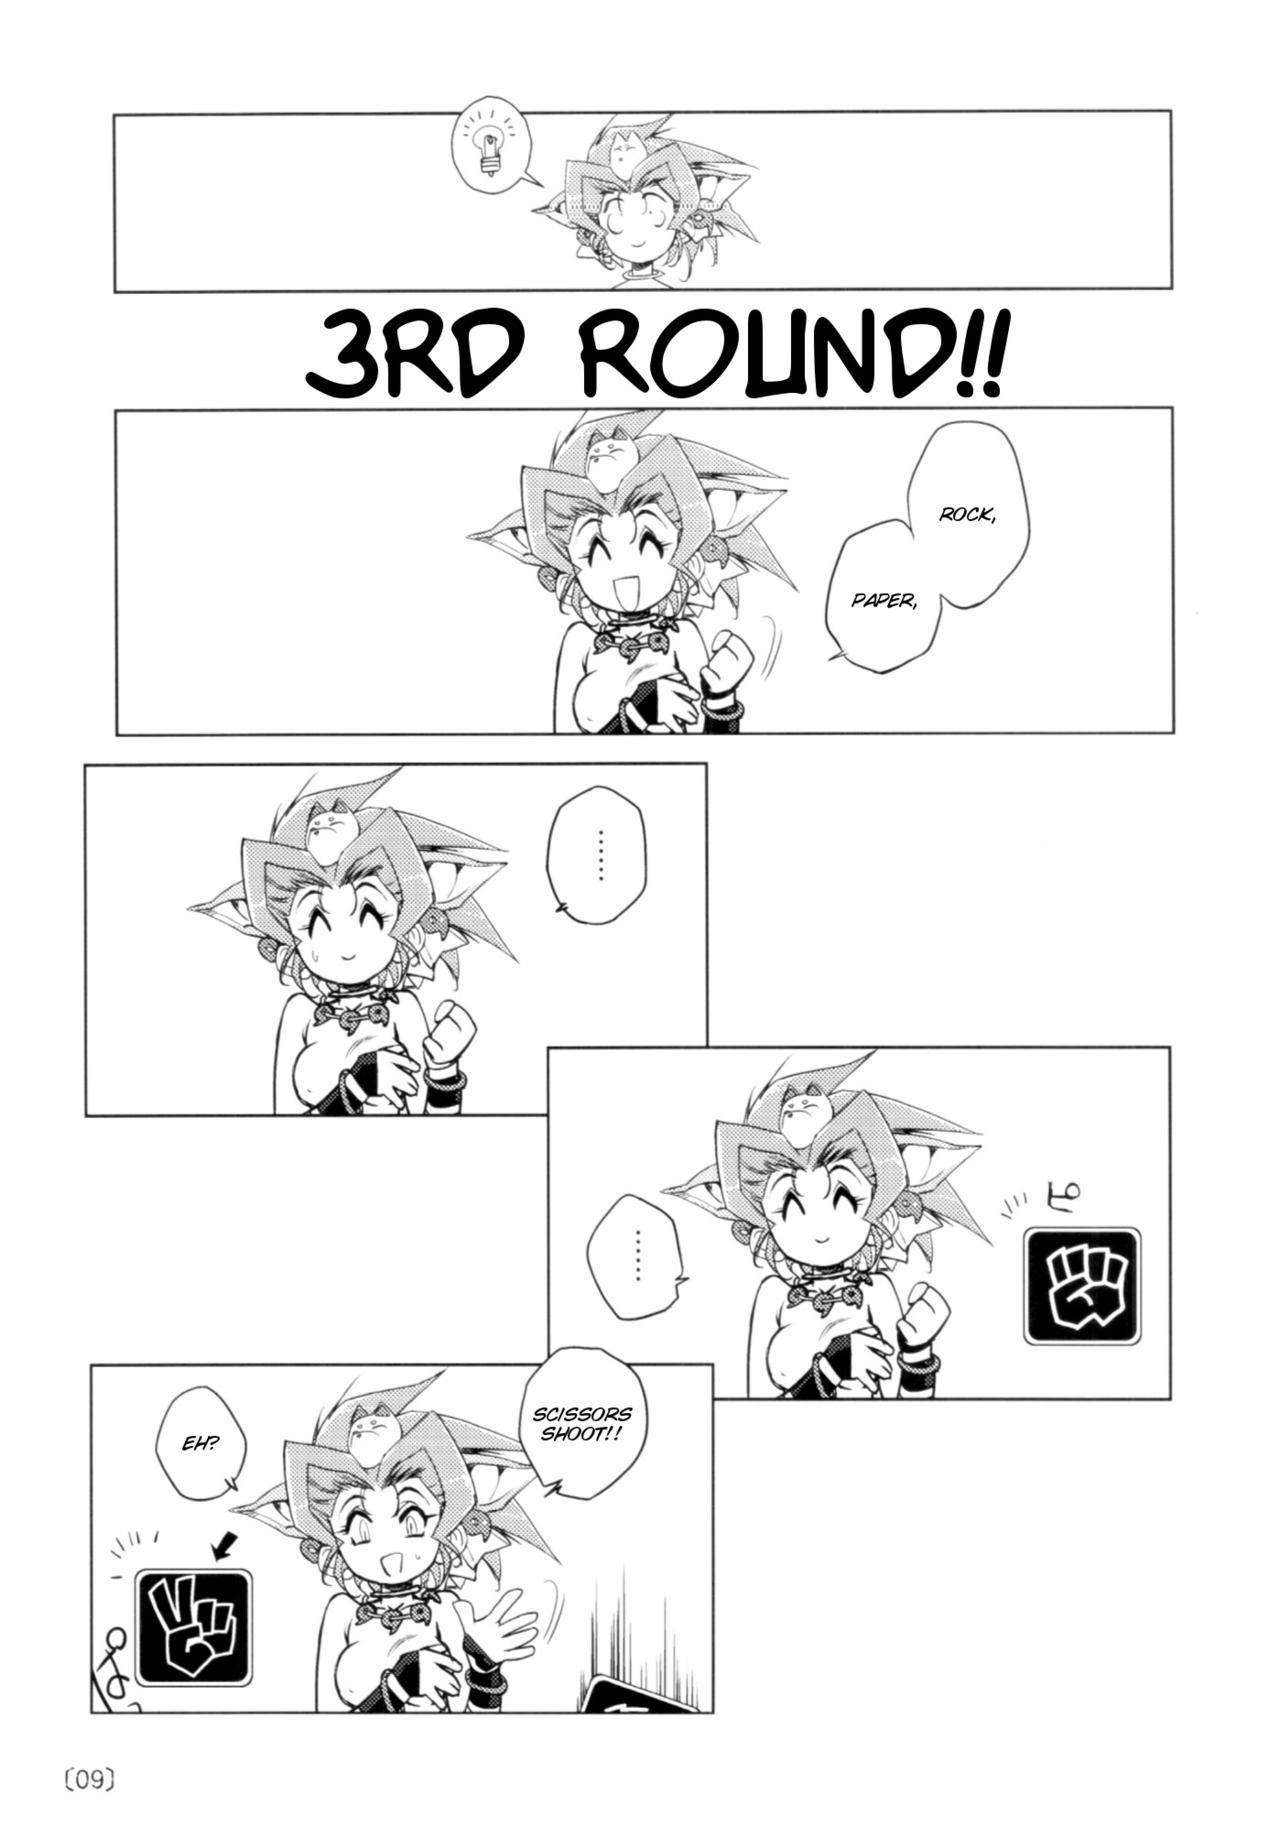 Kazuha RPS 8